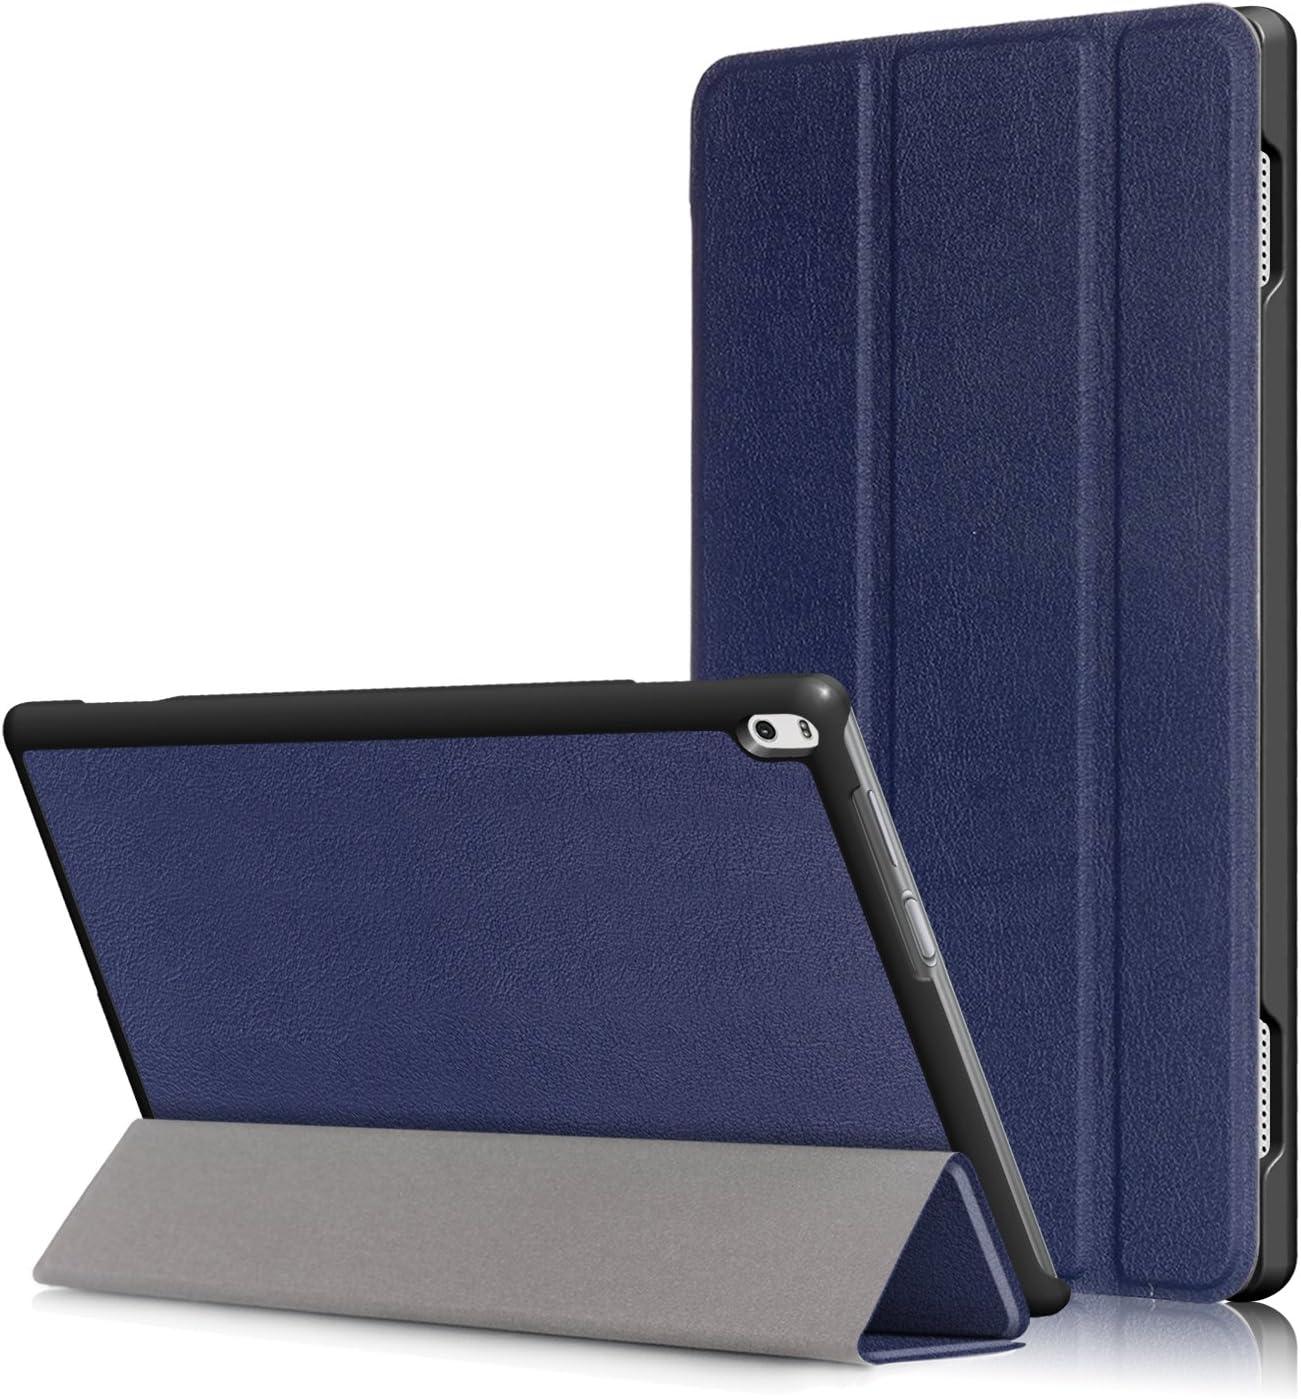 "Lenovo Tab 4 10"" Case, EpicGadget(TM) Lenovo Tab 4 10 (TB-X304F/N) Tri-fold Stand Ultra Lightweight Slim Cover PU Leather Case For Lenovo Tab 4 10"" (2017) (Navy Blue)"